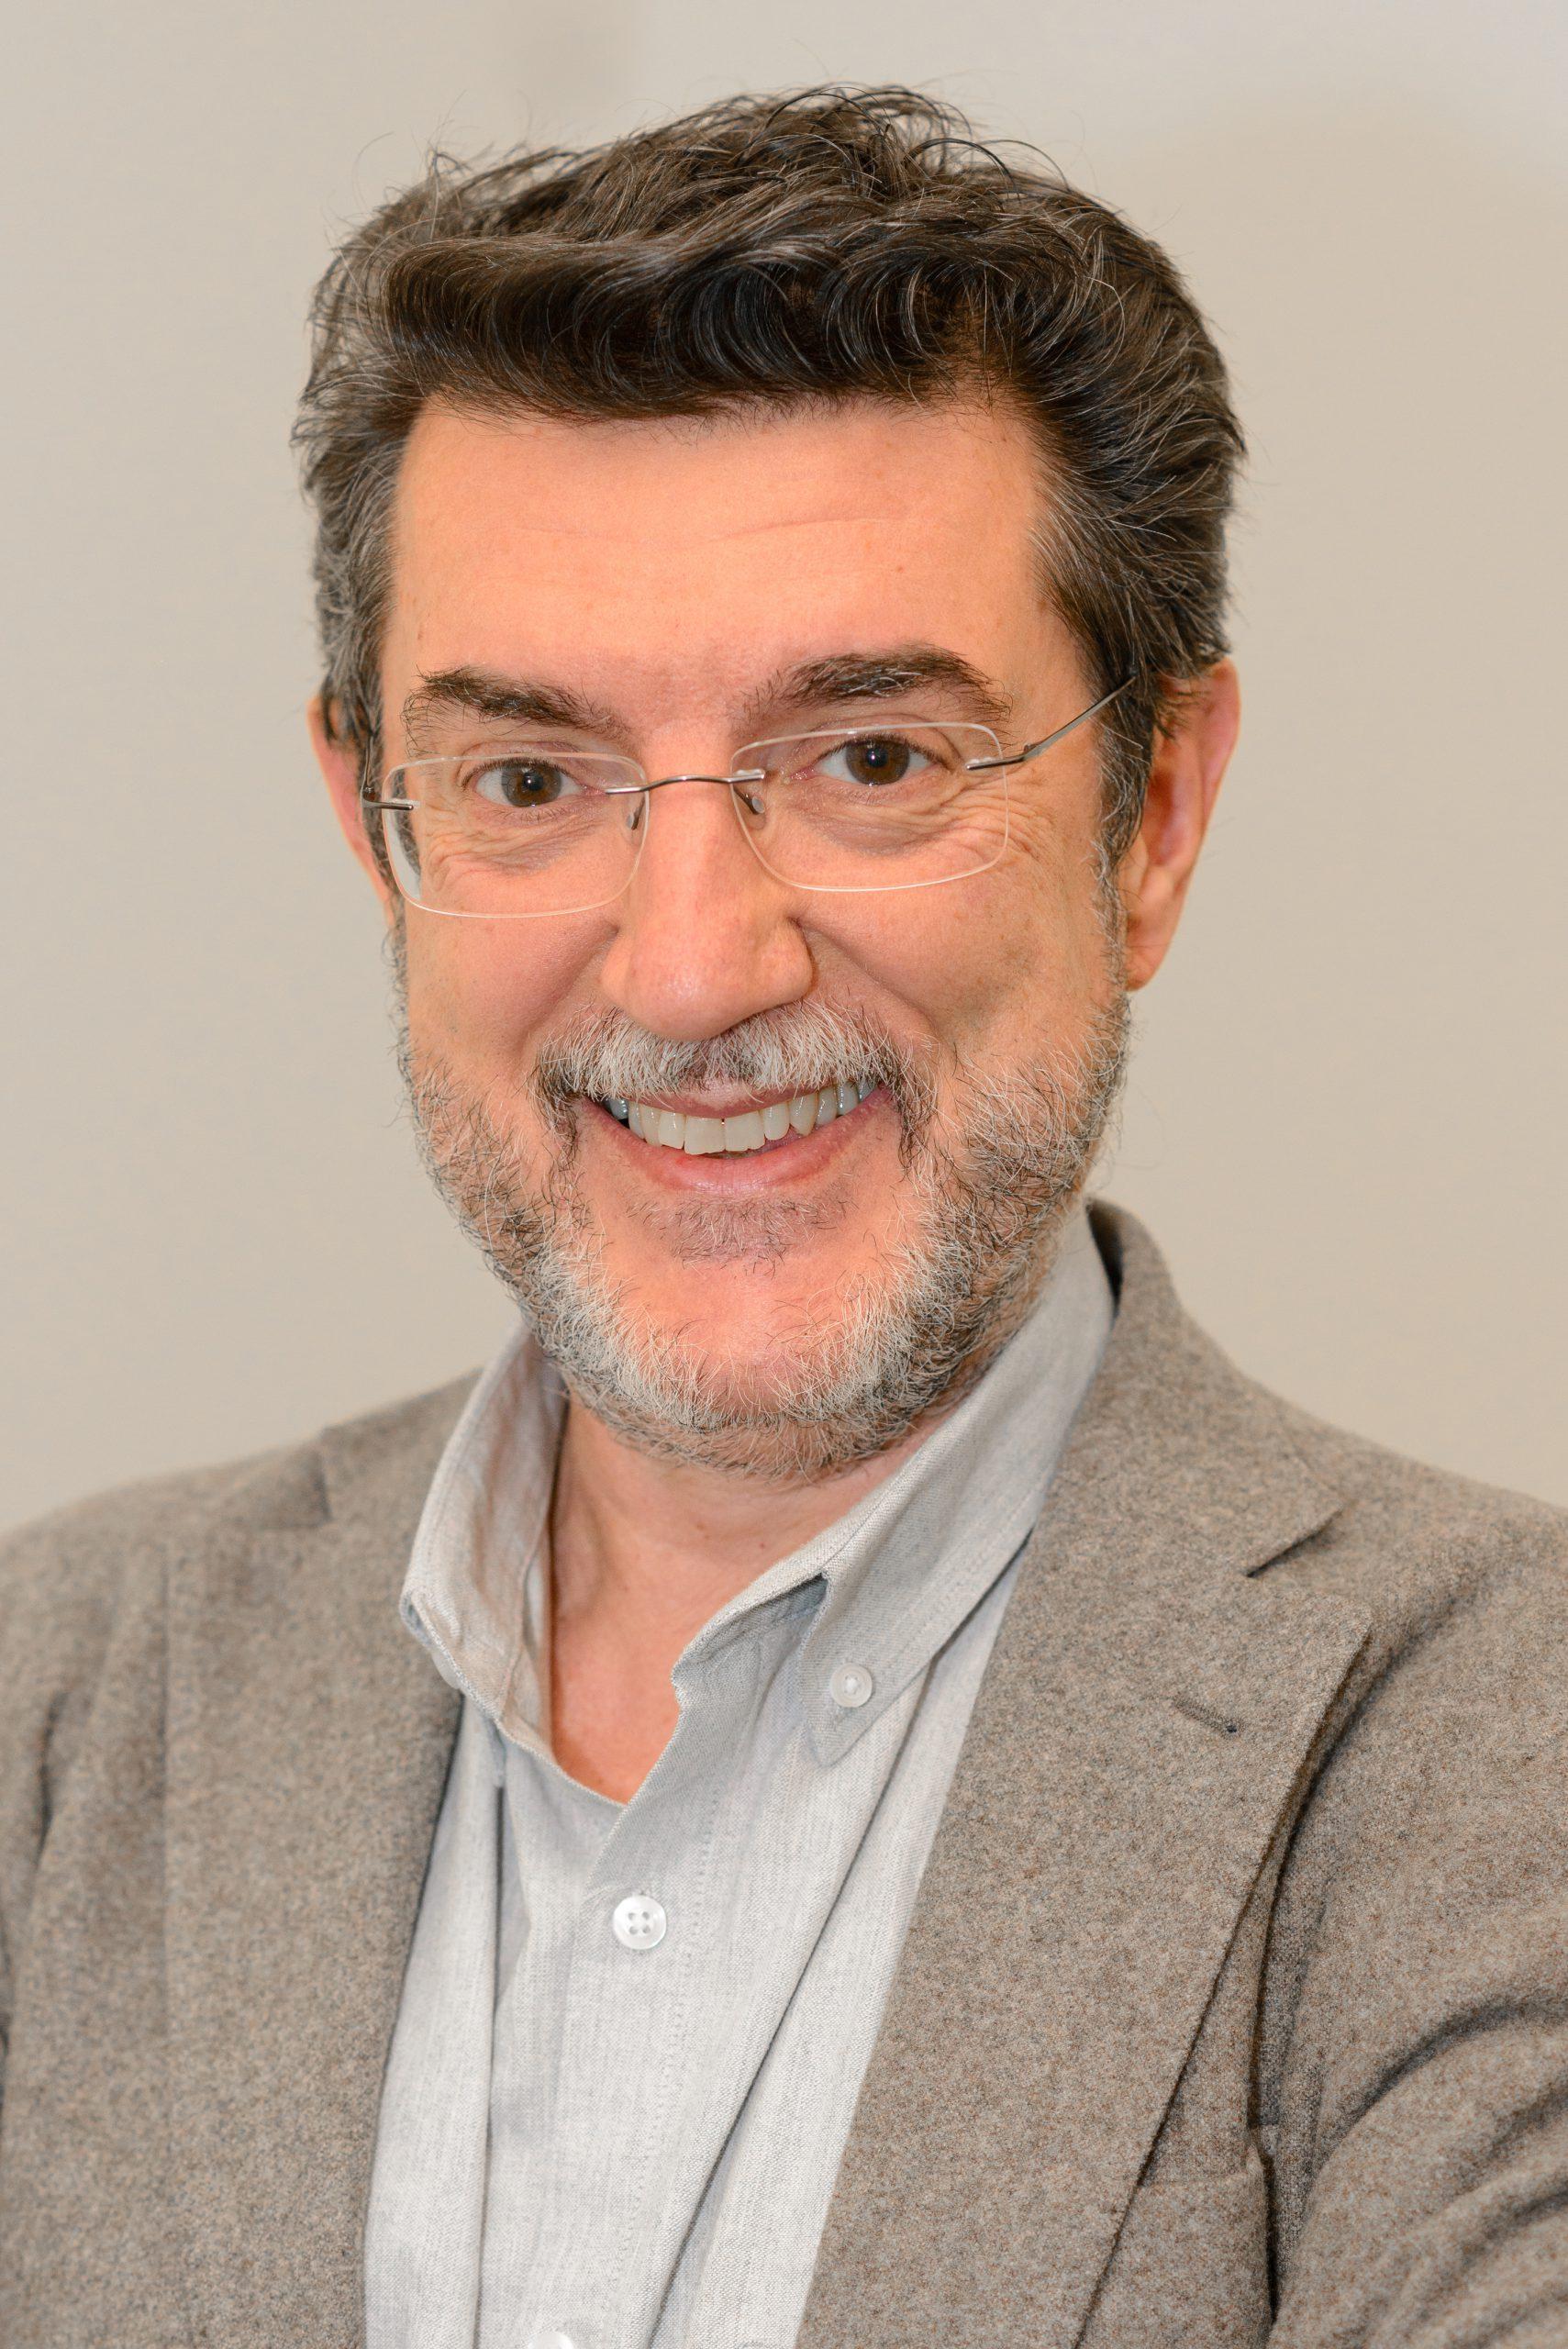 Bertrando Paolo